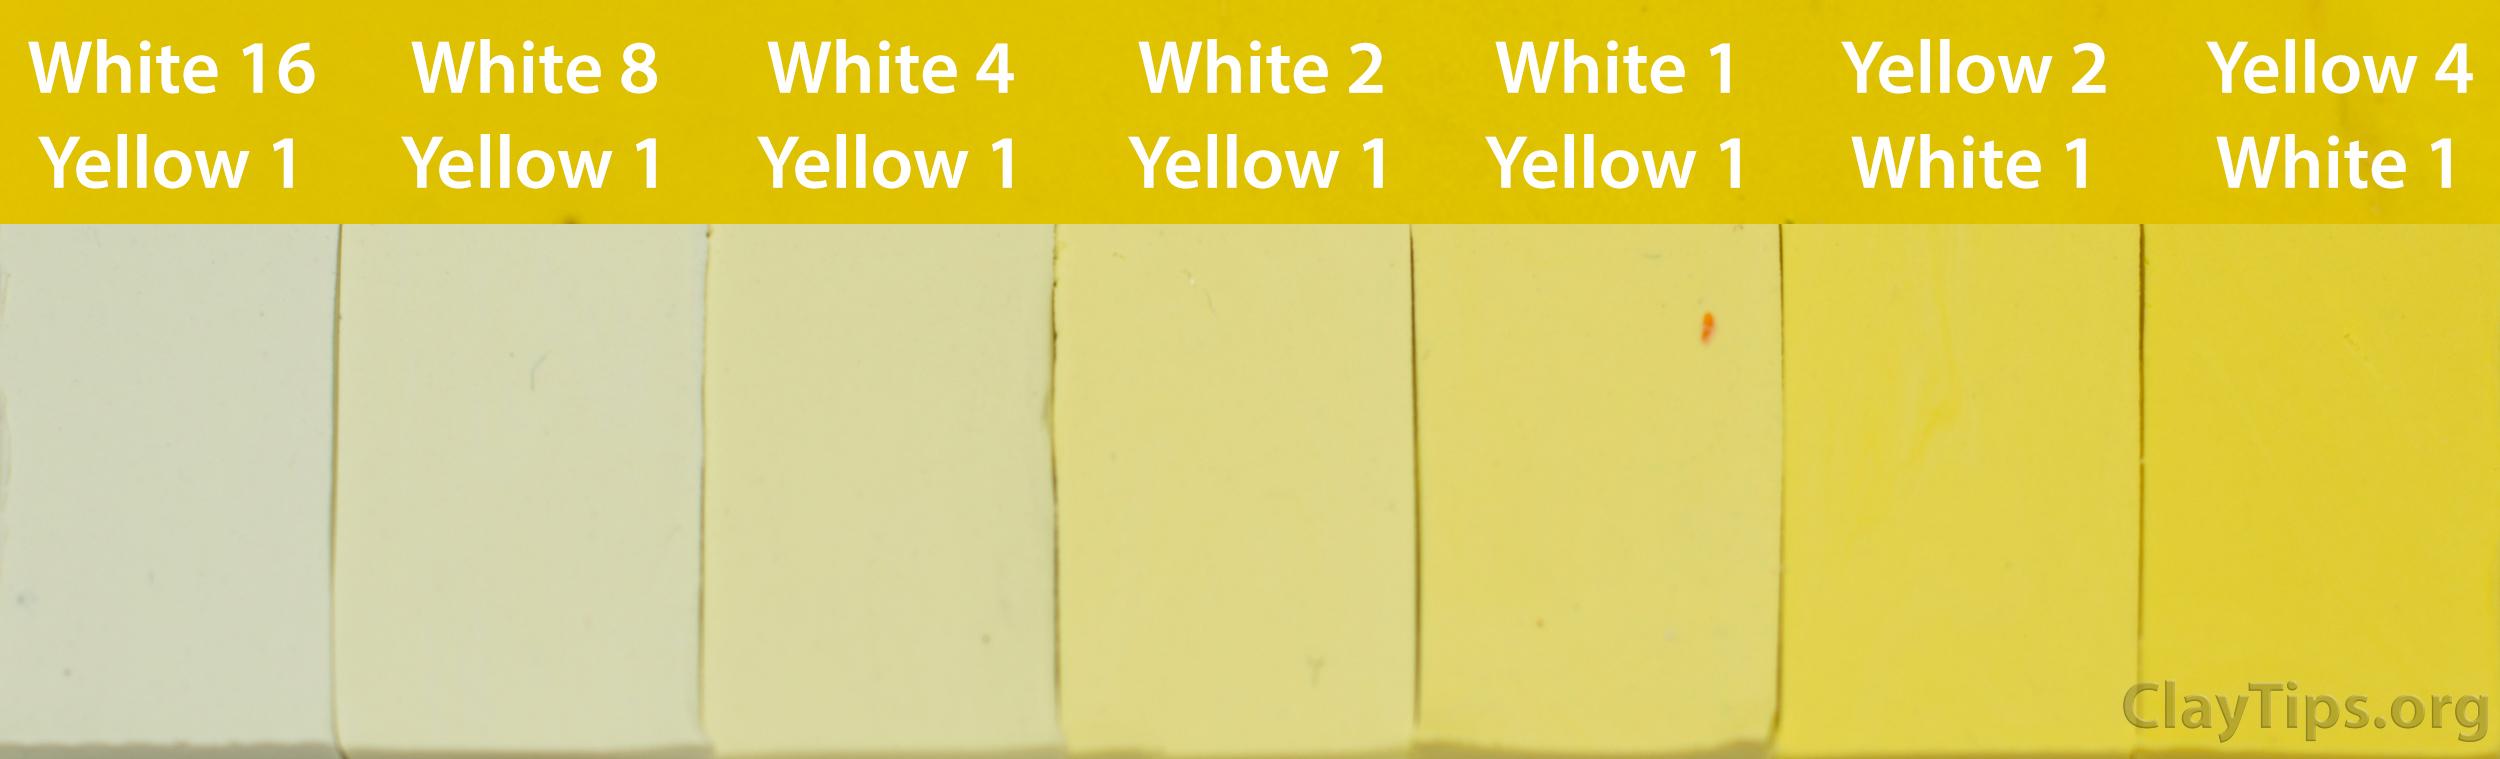 Yellow and White Plasticine